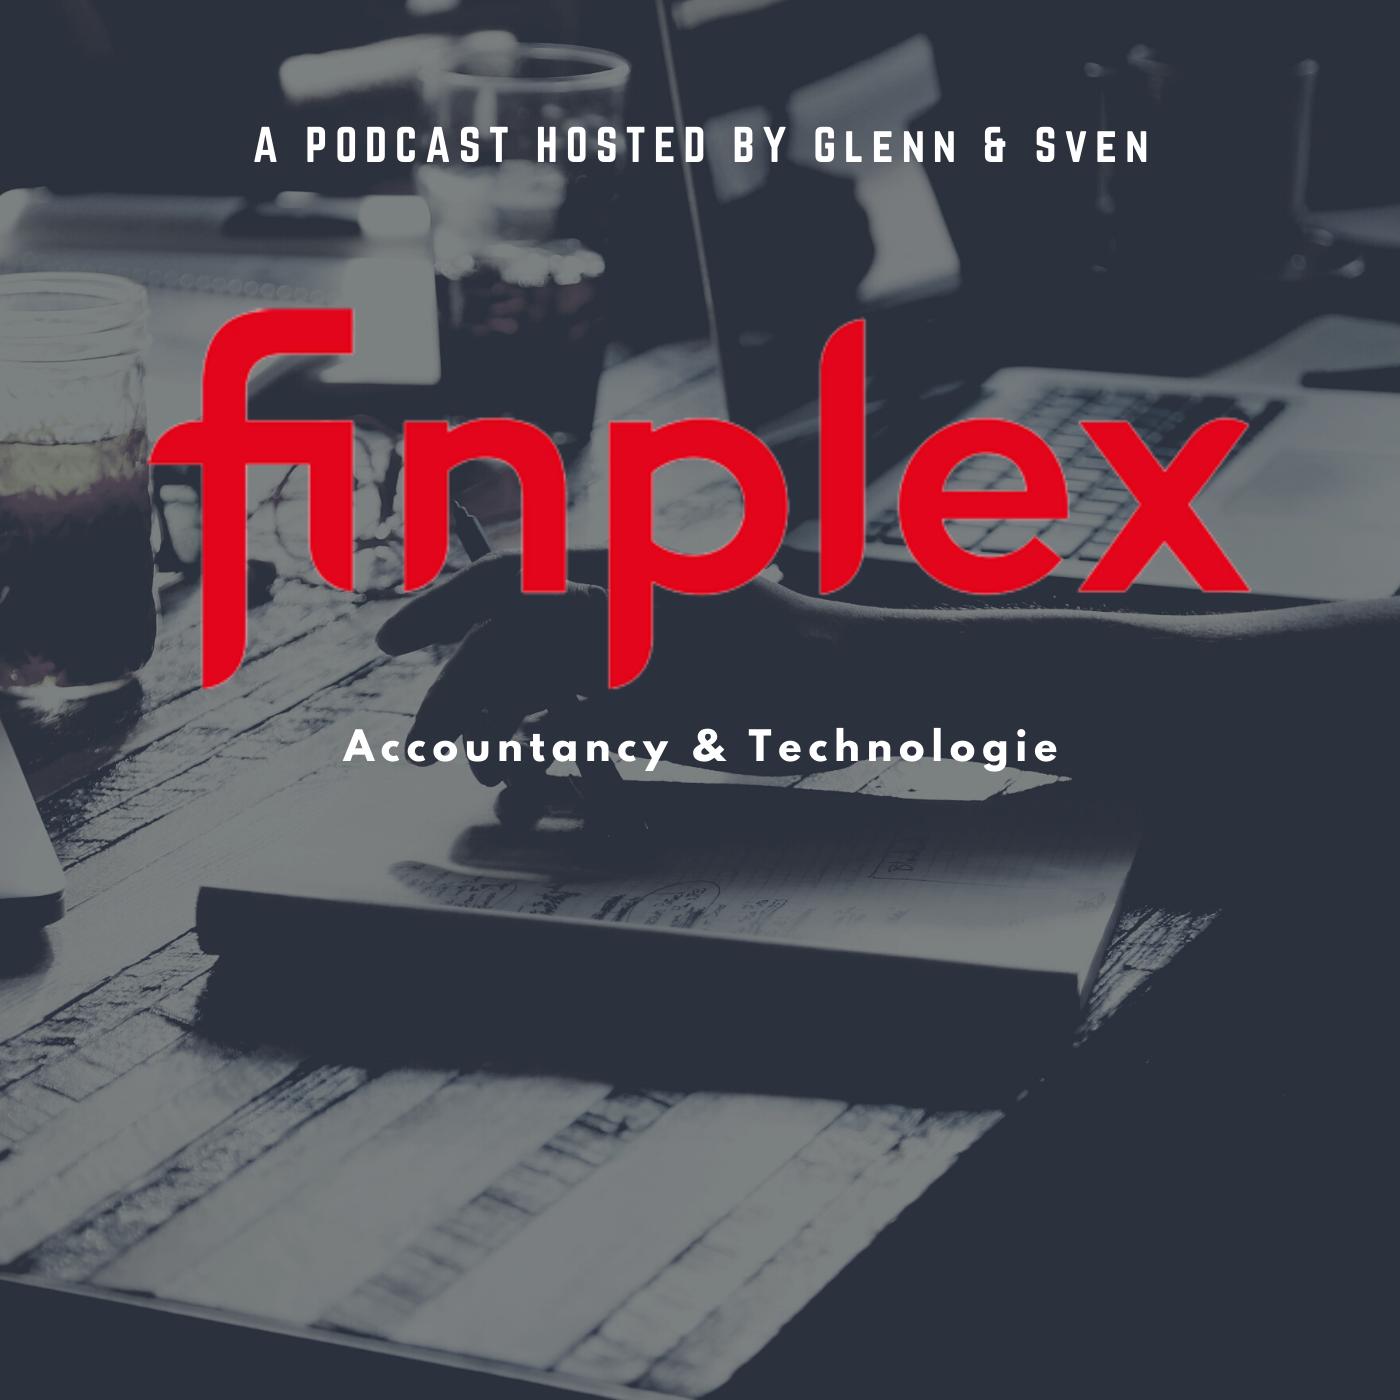 Podcast Finplex